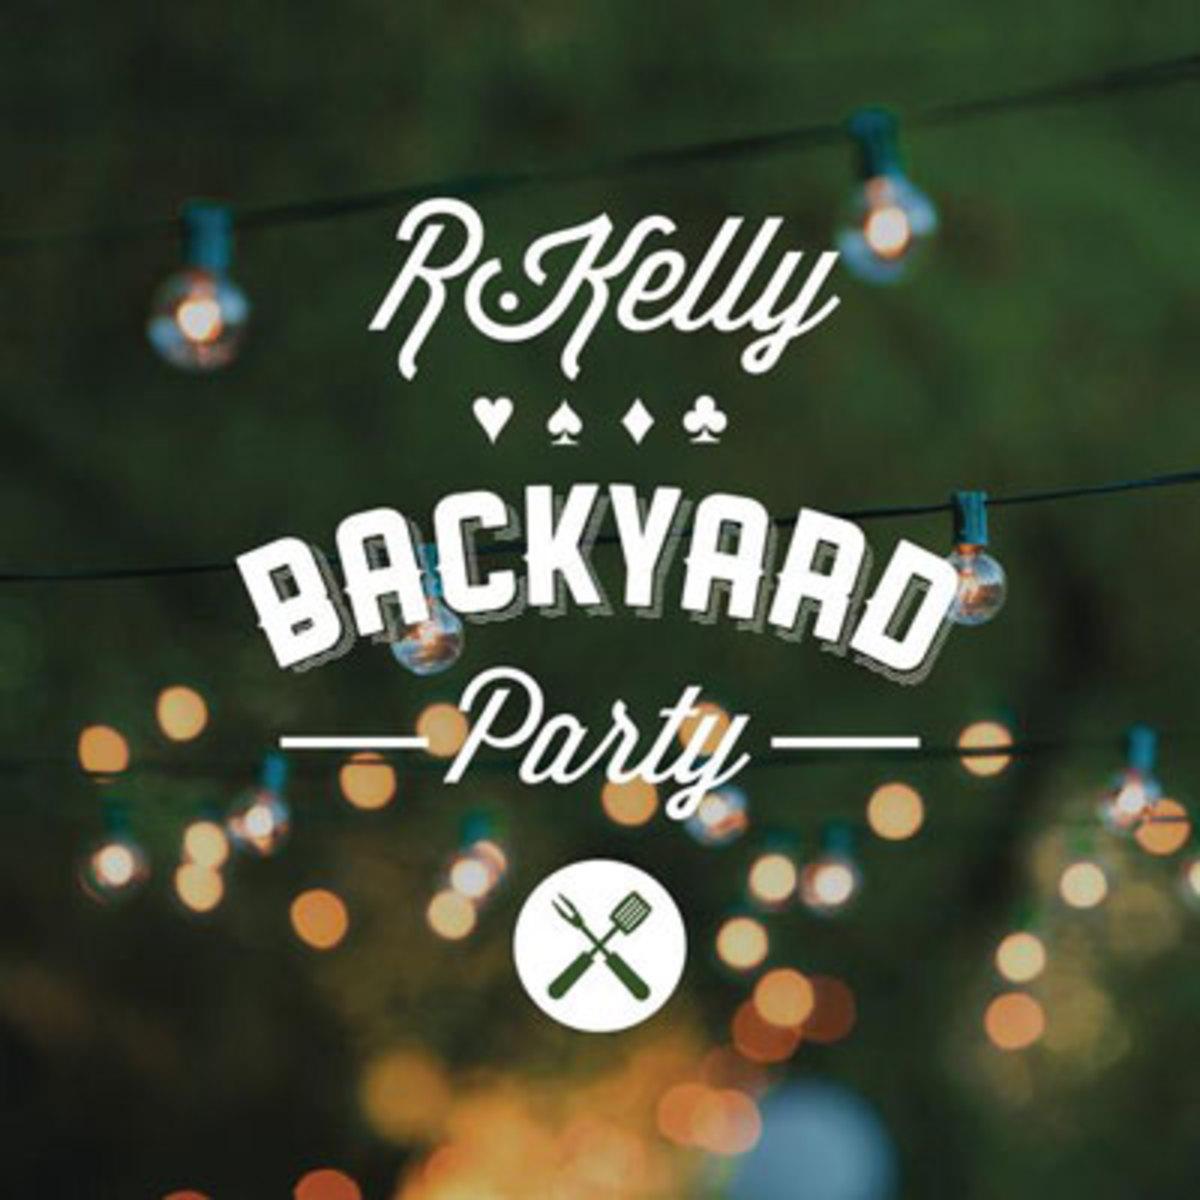 r-kelly-backyard-party.jpg